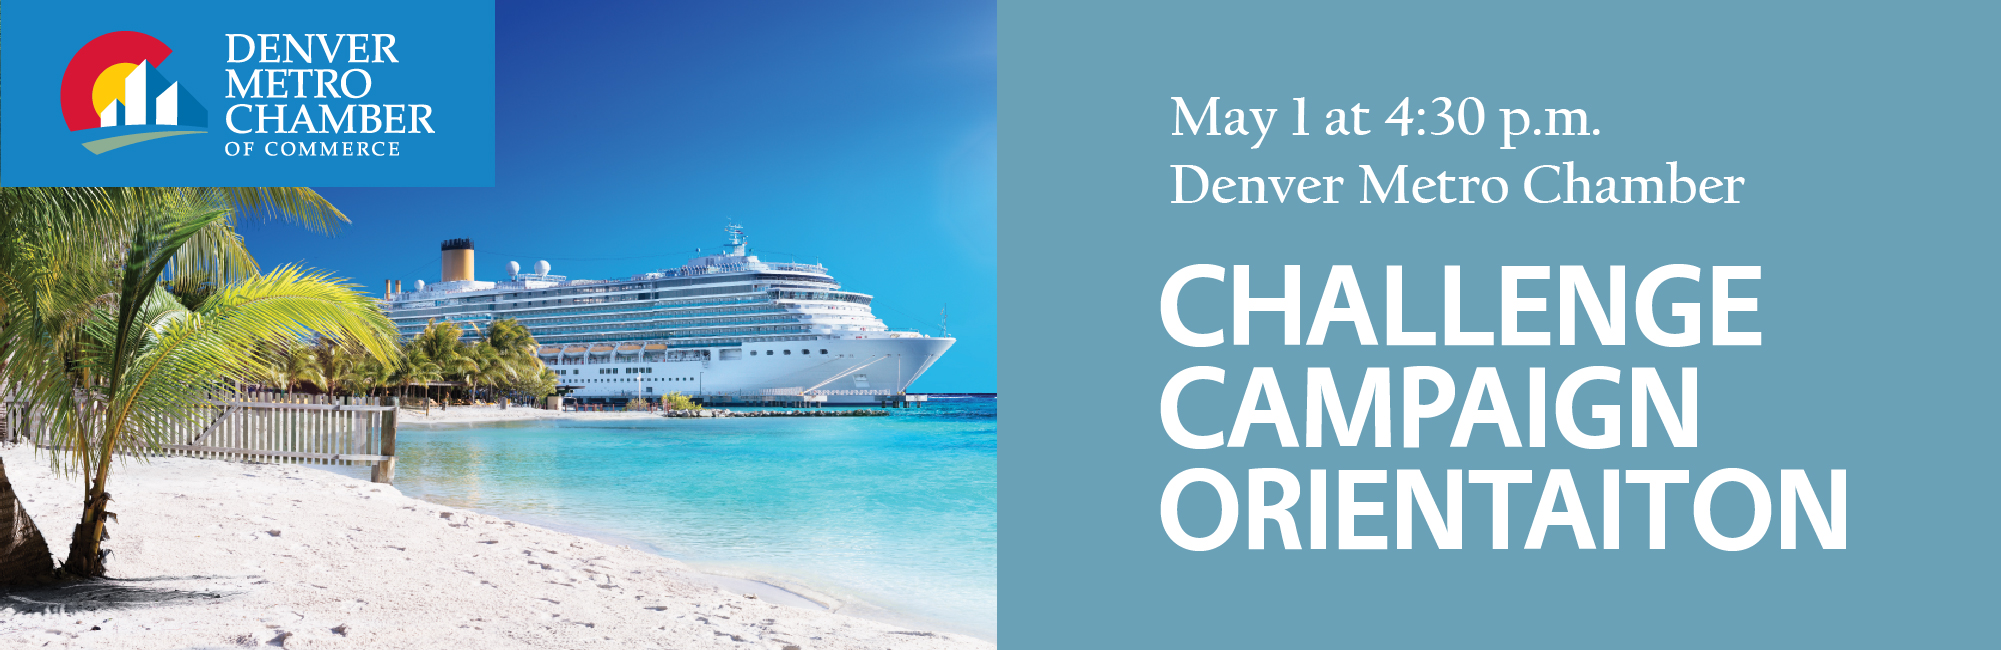 2018 Spring Challenge Campaign Orientation